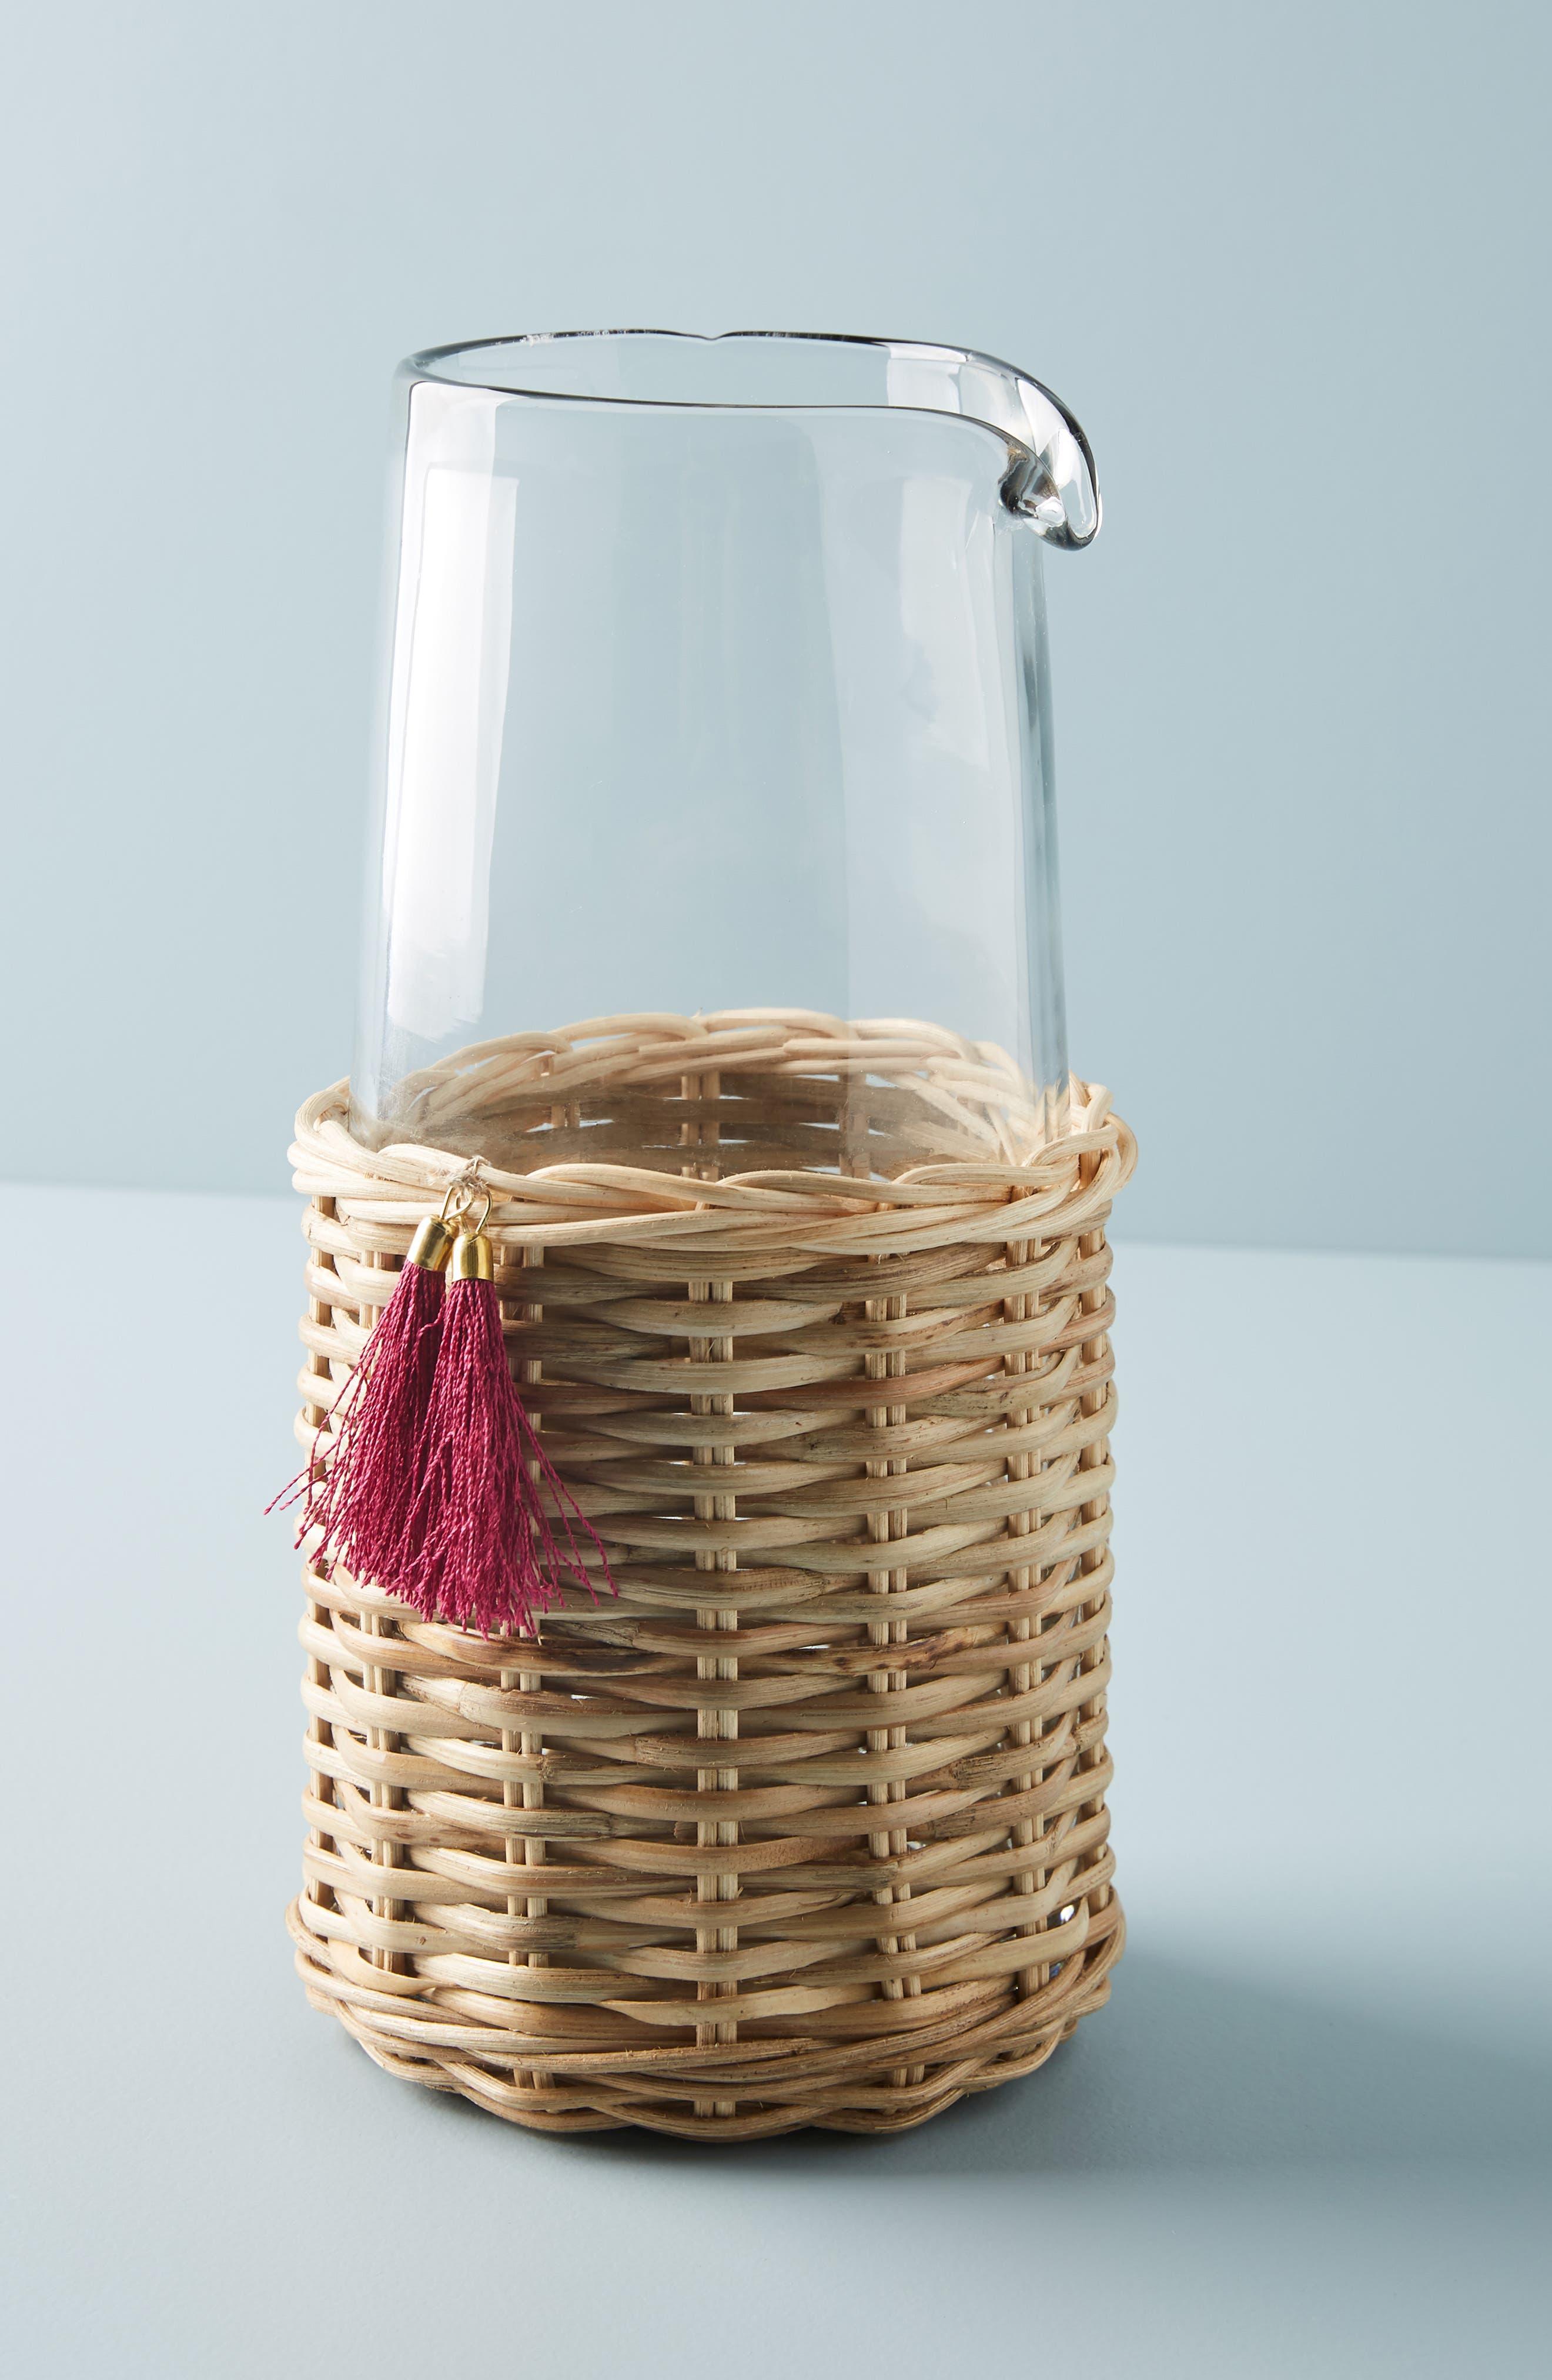 anthropologie elena glass pitcher